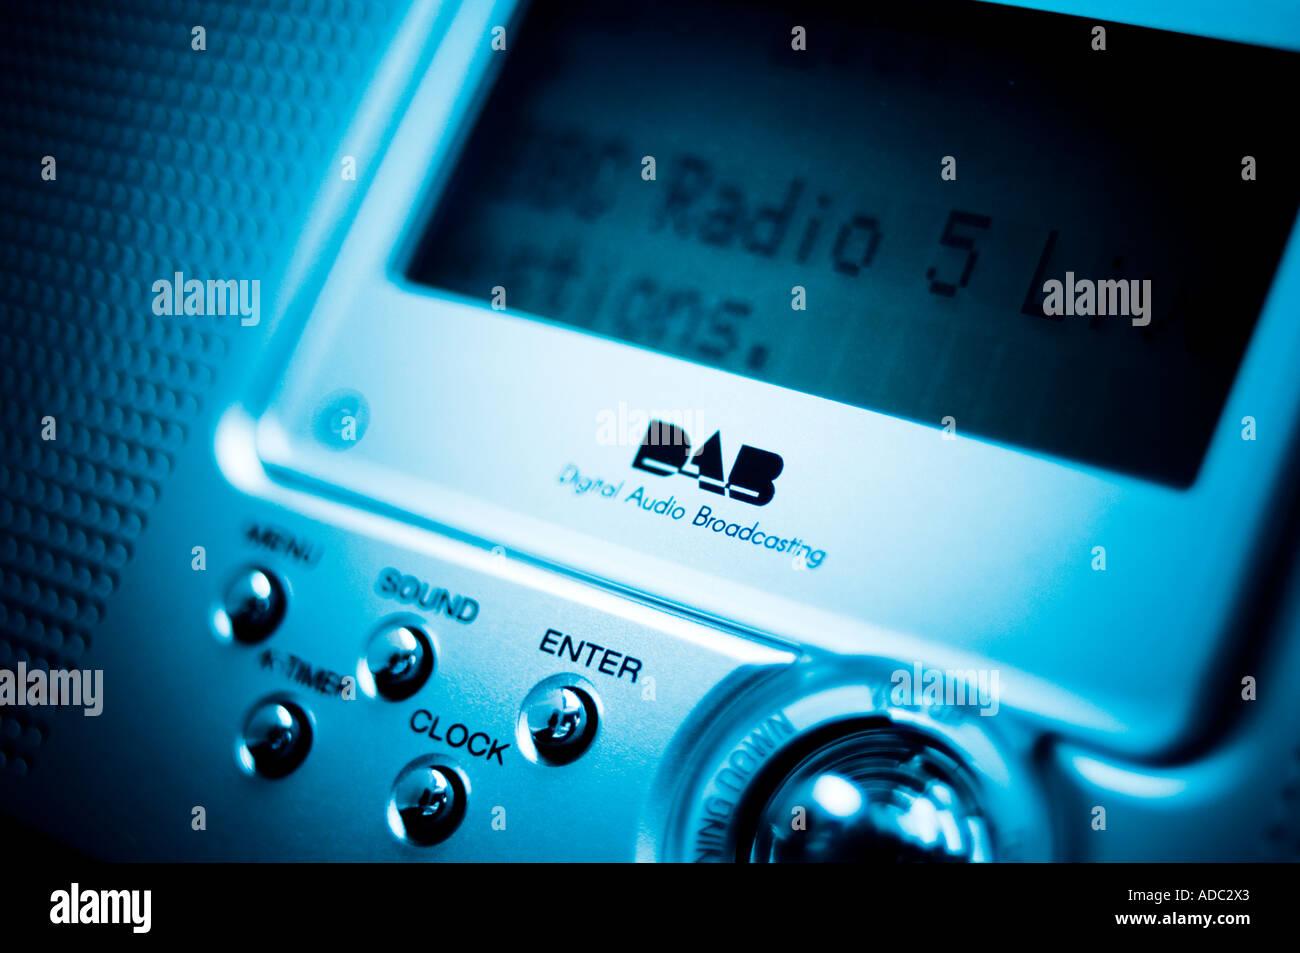 Digital Radio Stock Photos & Digital Radio Stock Images - Alamy